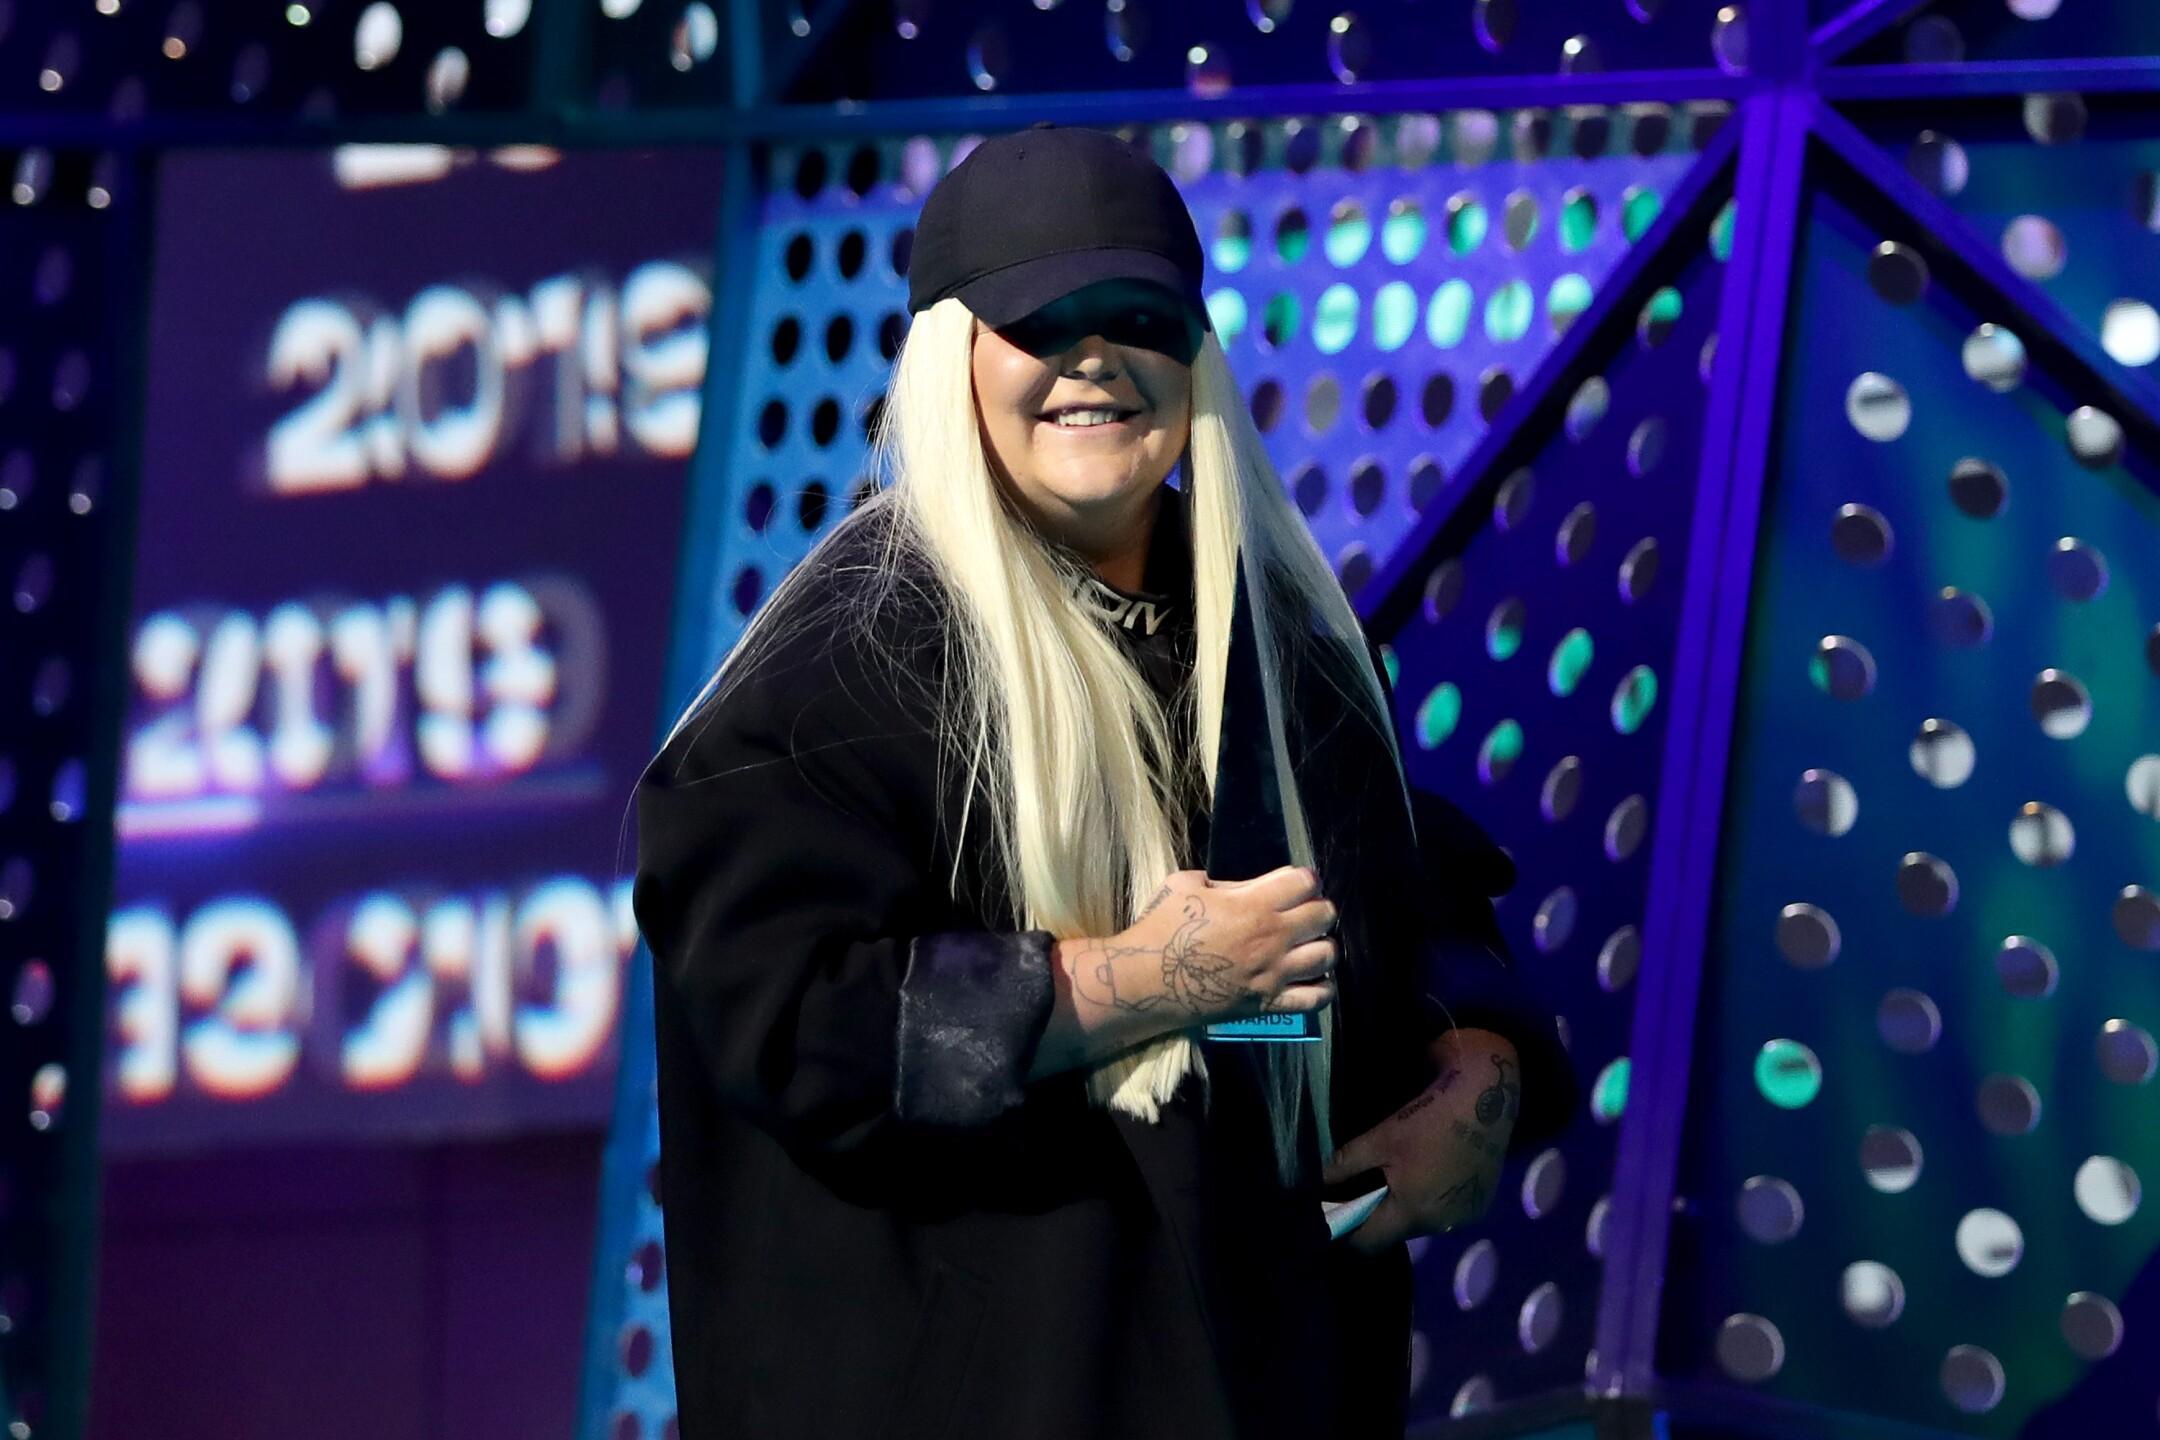 33rd Annual ARIA Awards 2019 - Show